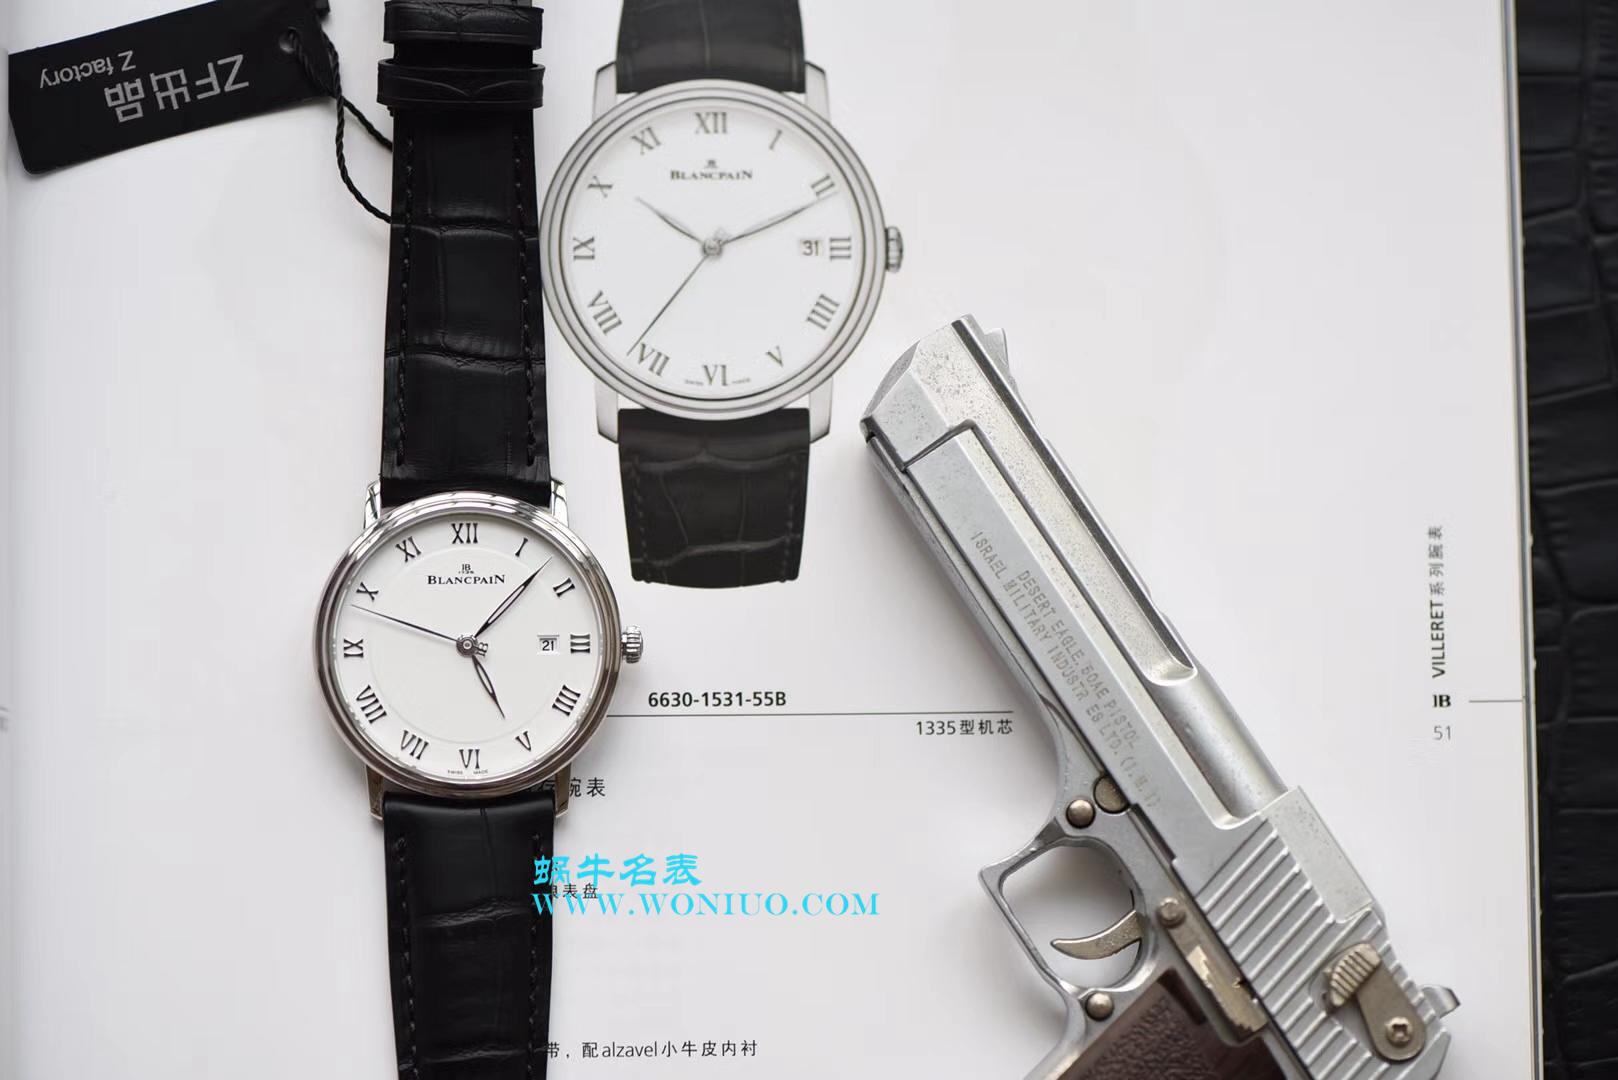 【ZF一比一超A高仿手表】宝珀经典系列6651-1127-55B腕表